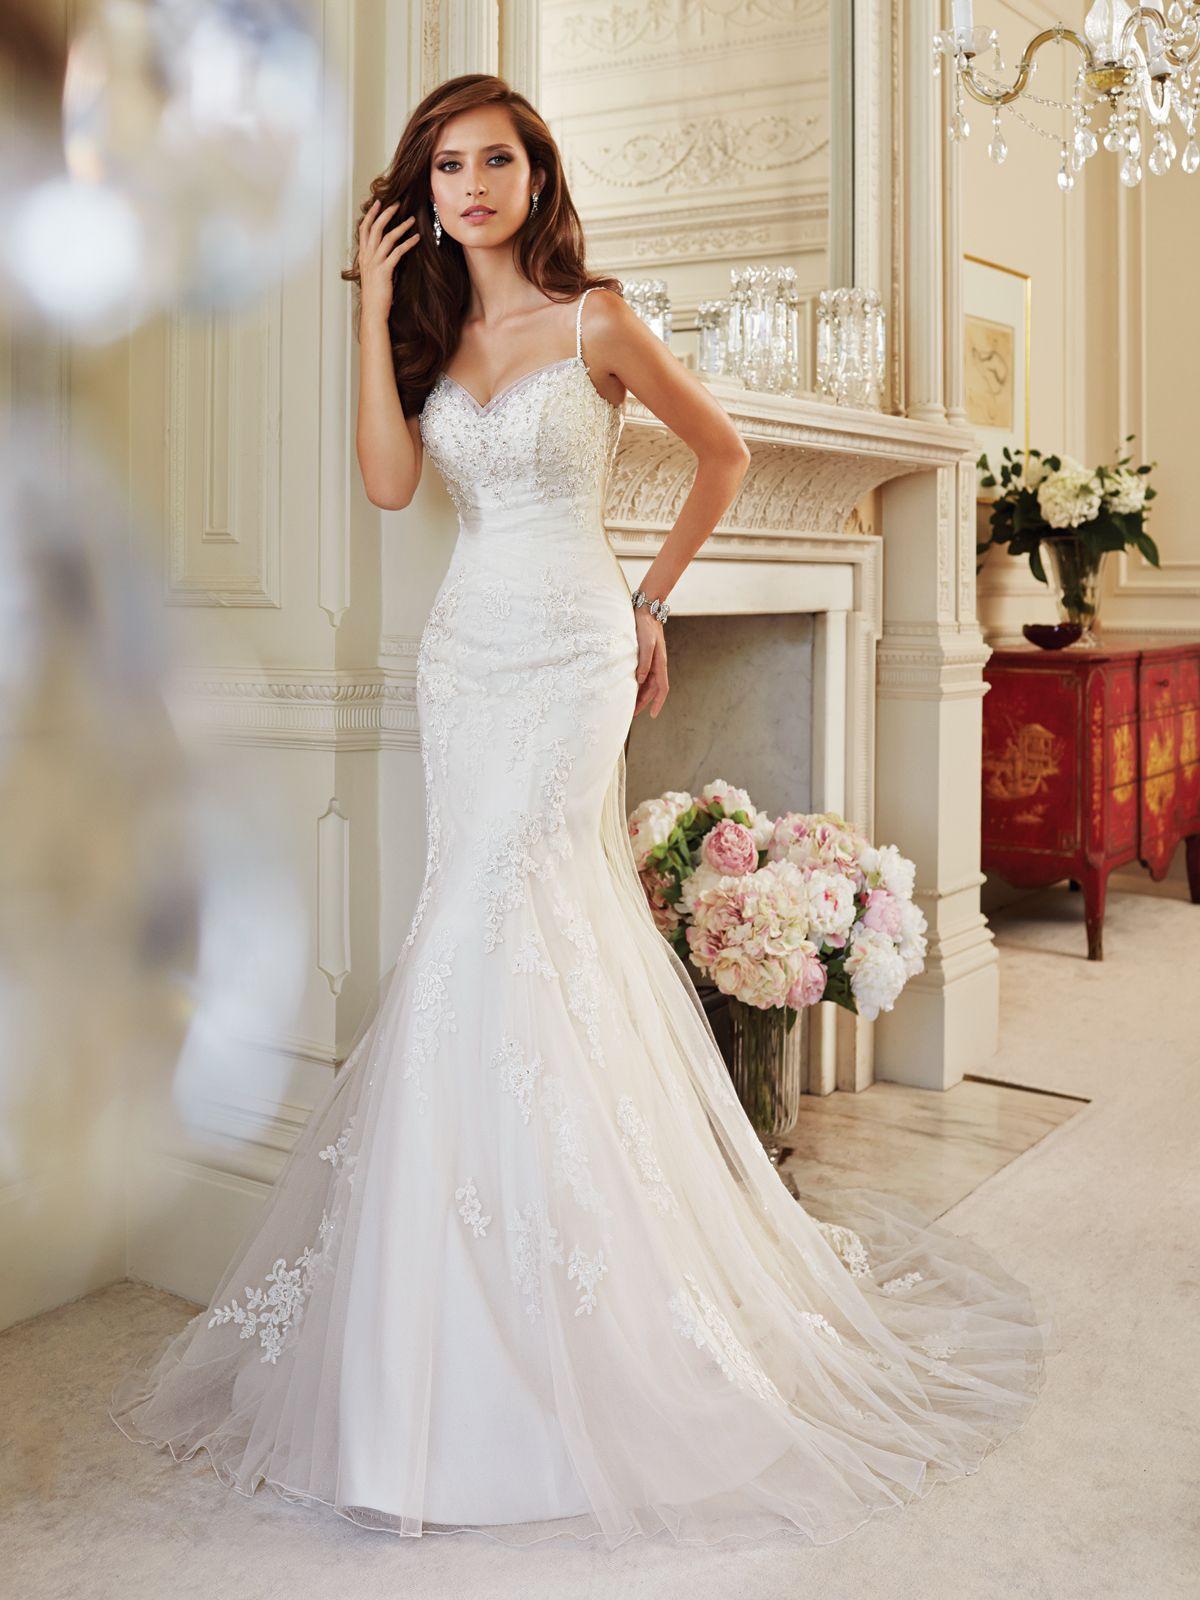 Sophia Tolli Wedding Dresses 2018 for Mon Cheri   Brautkleider und ...